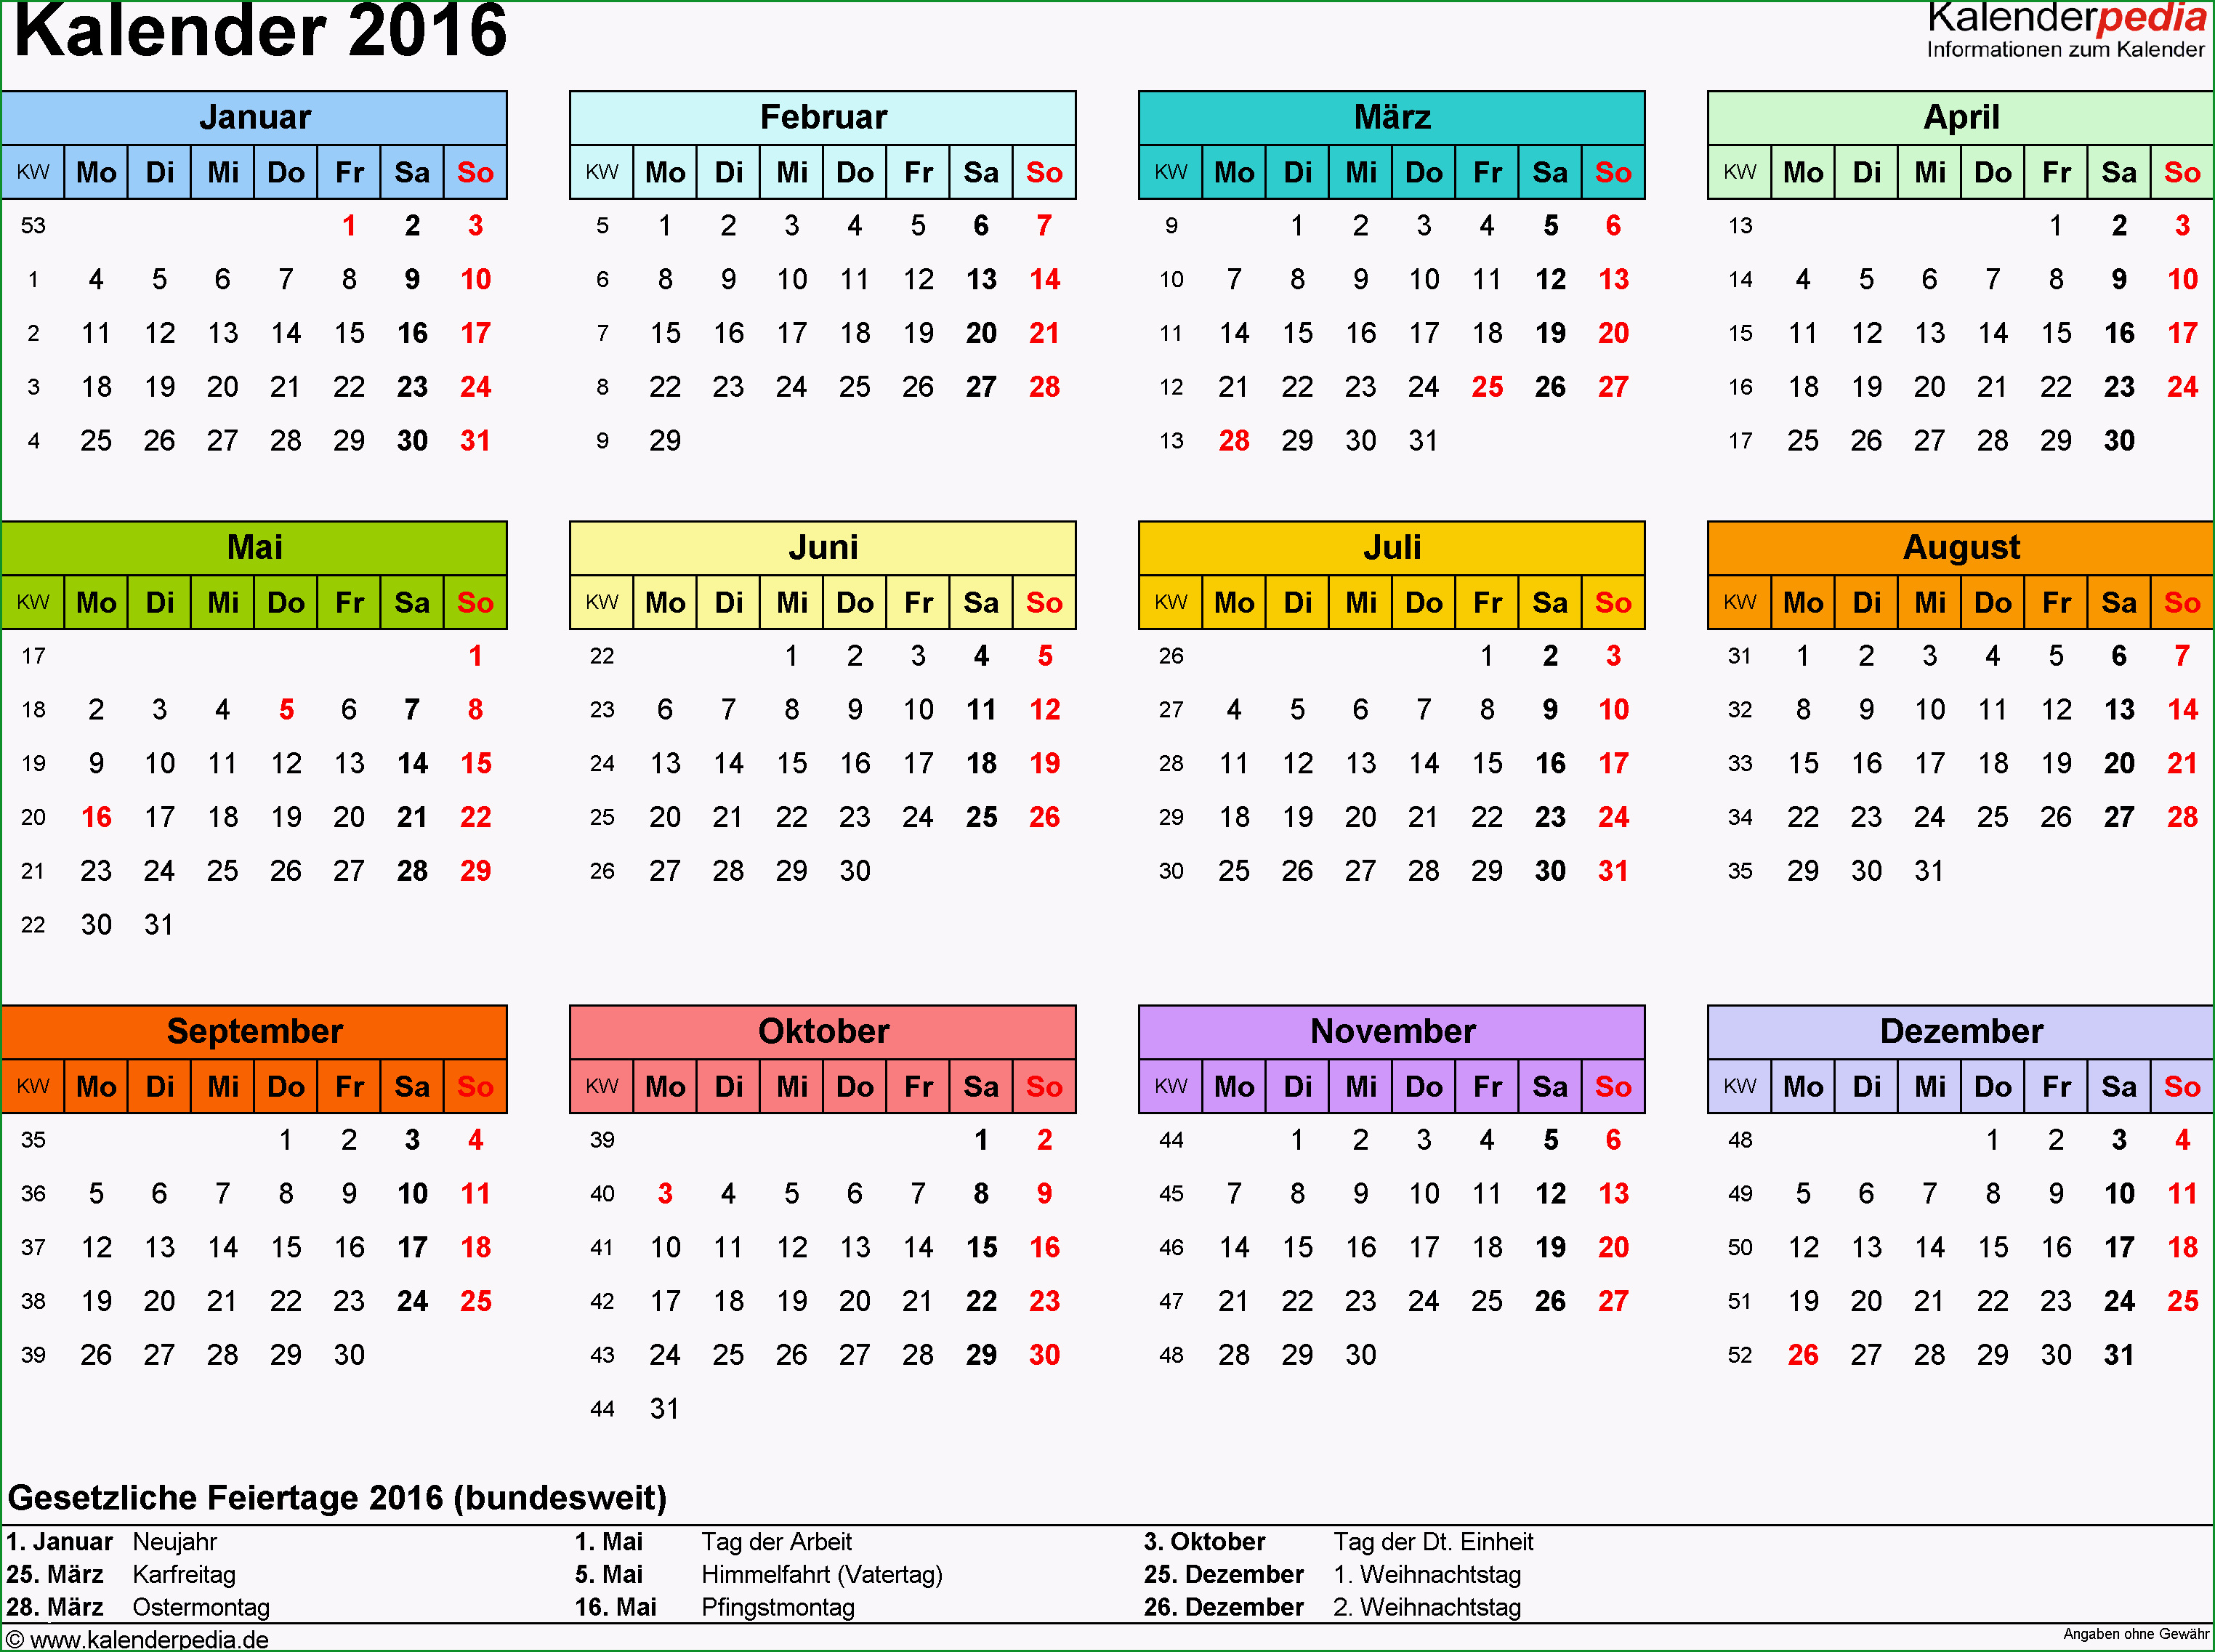 kalender 2016 pdf vorlagen